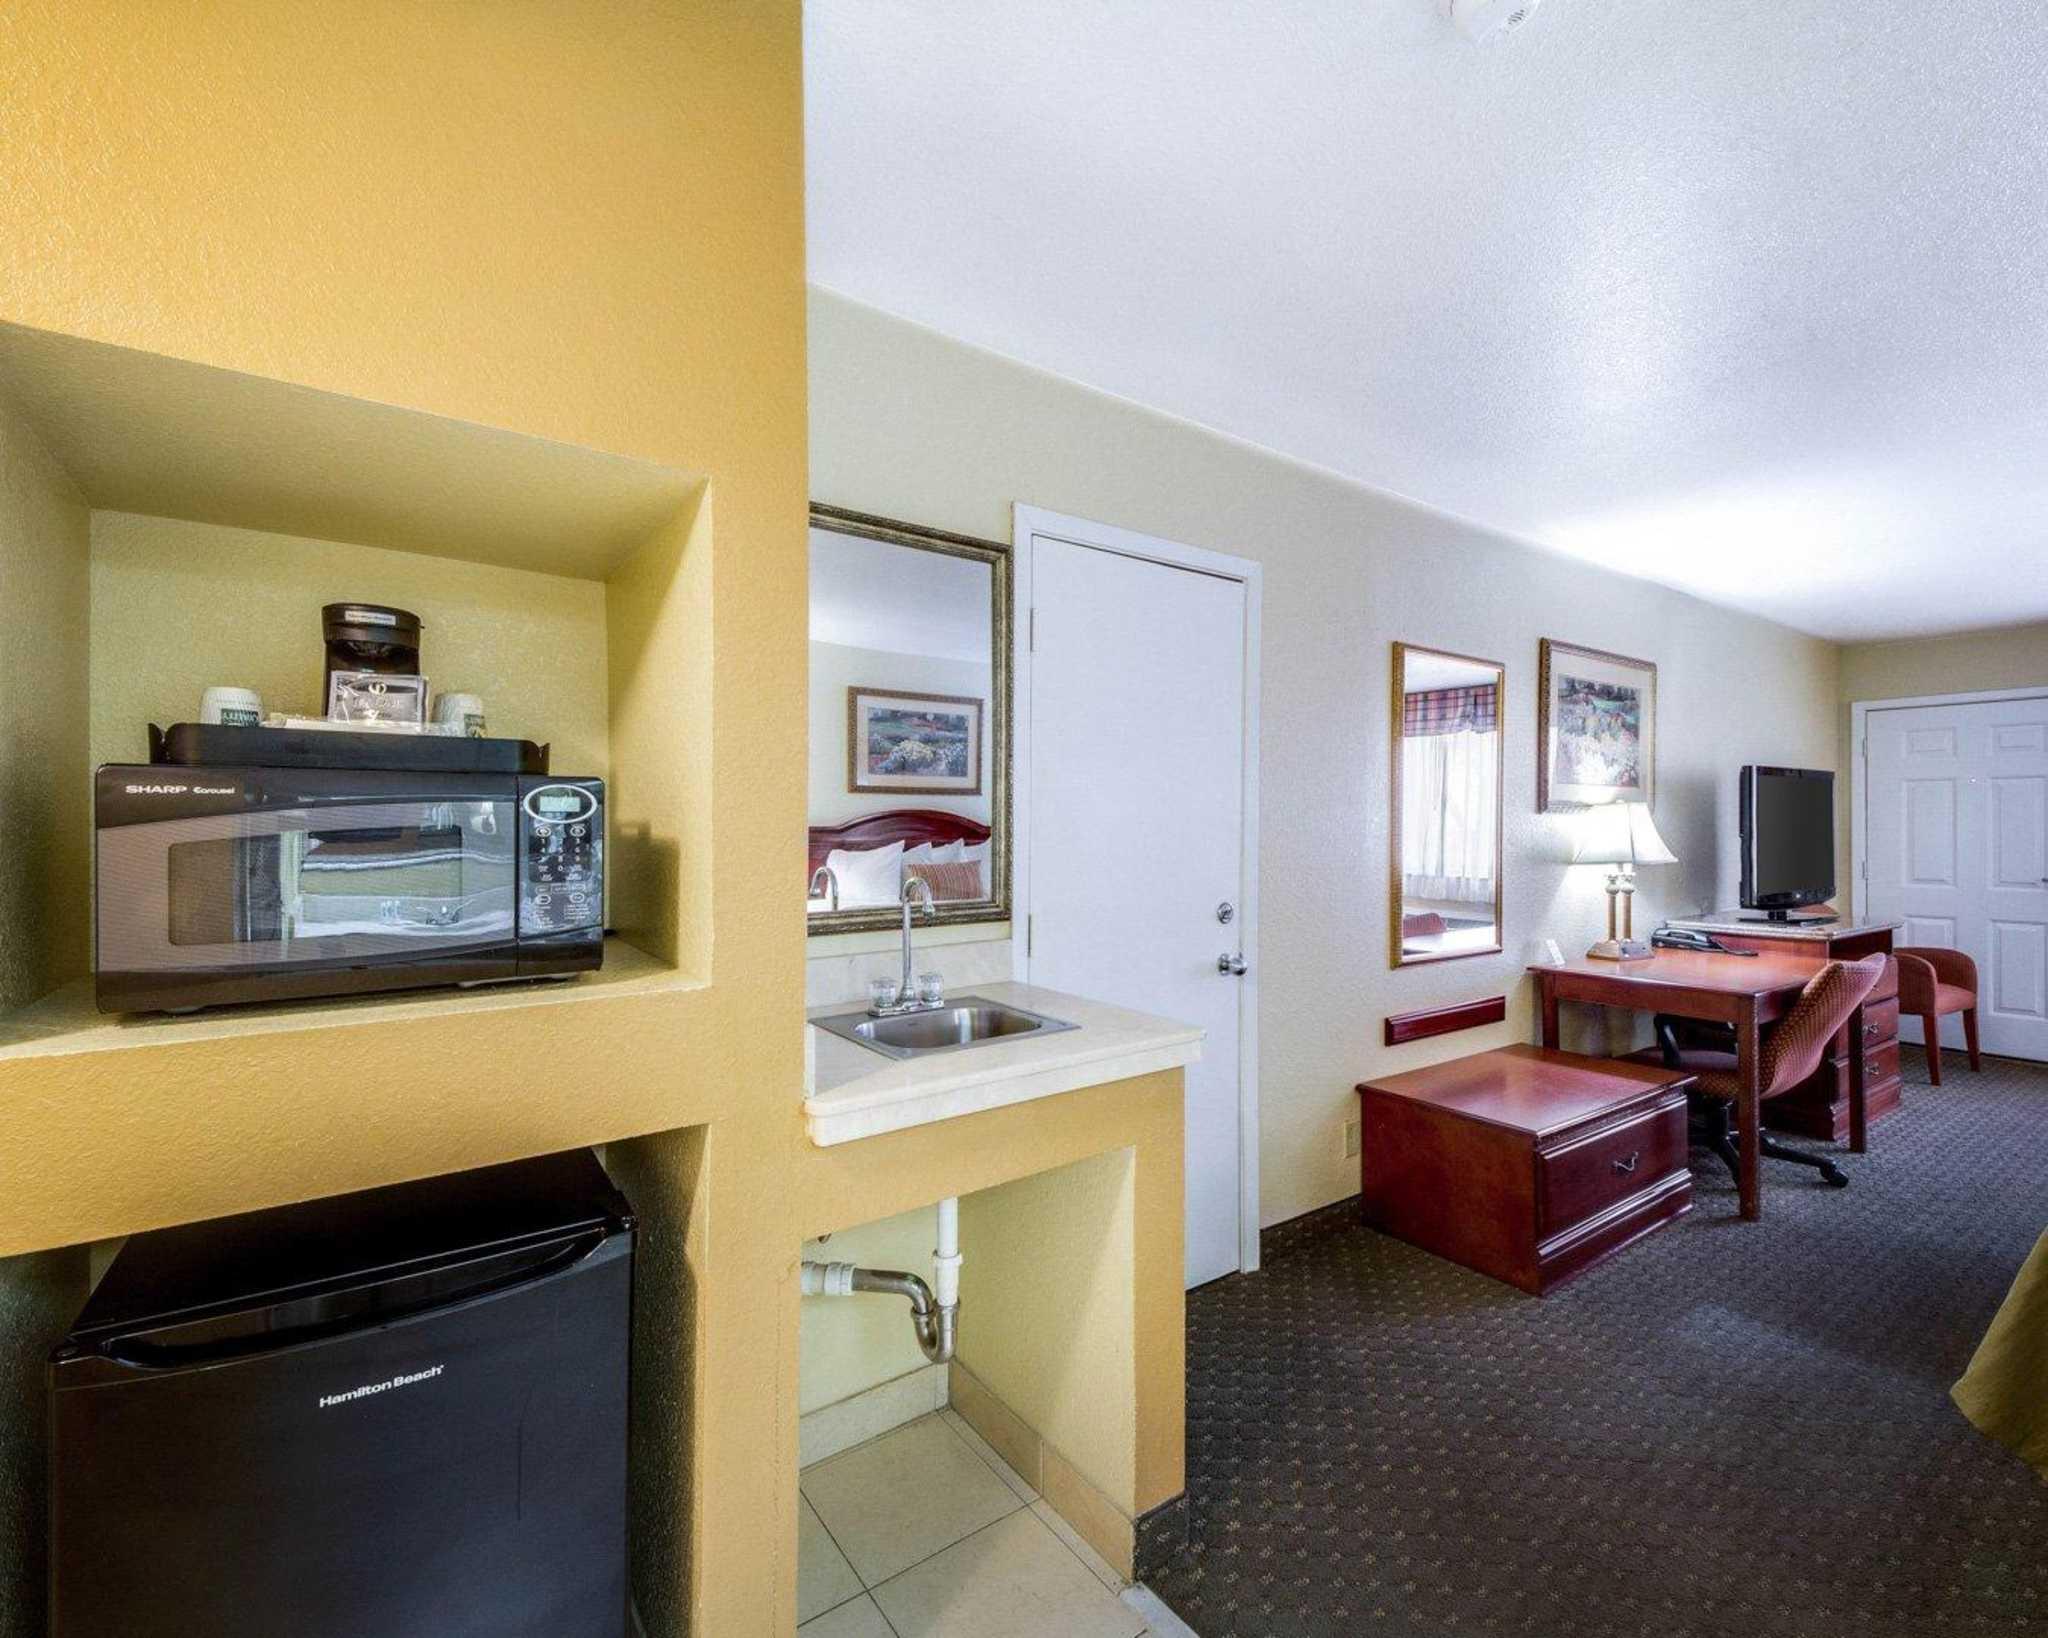 Quality Inn & Suites Eagle Pass image 21